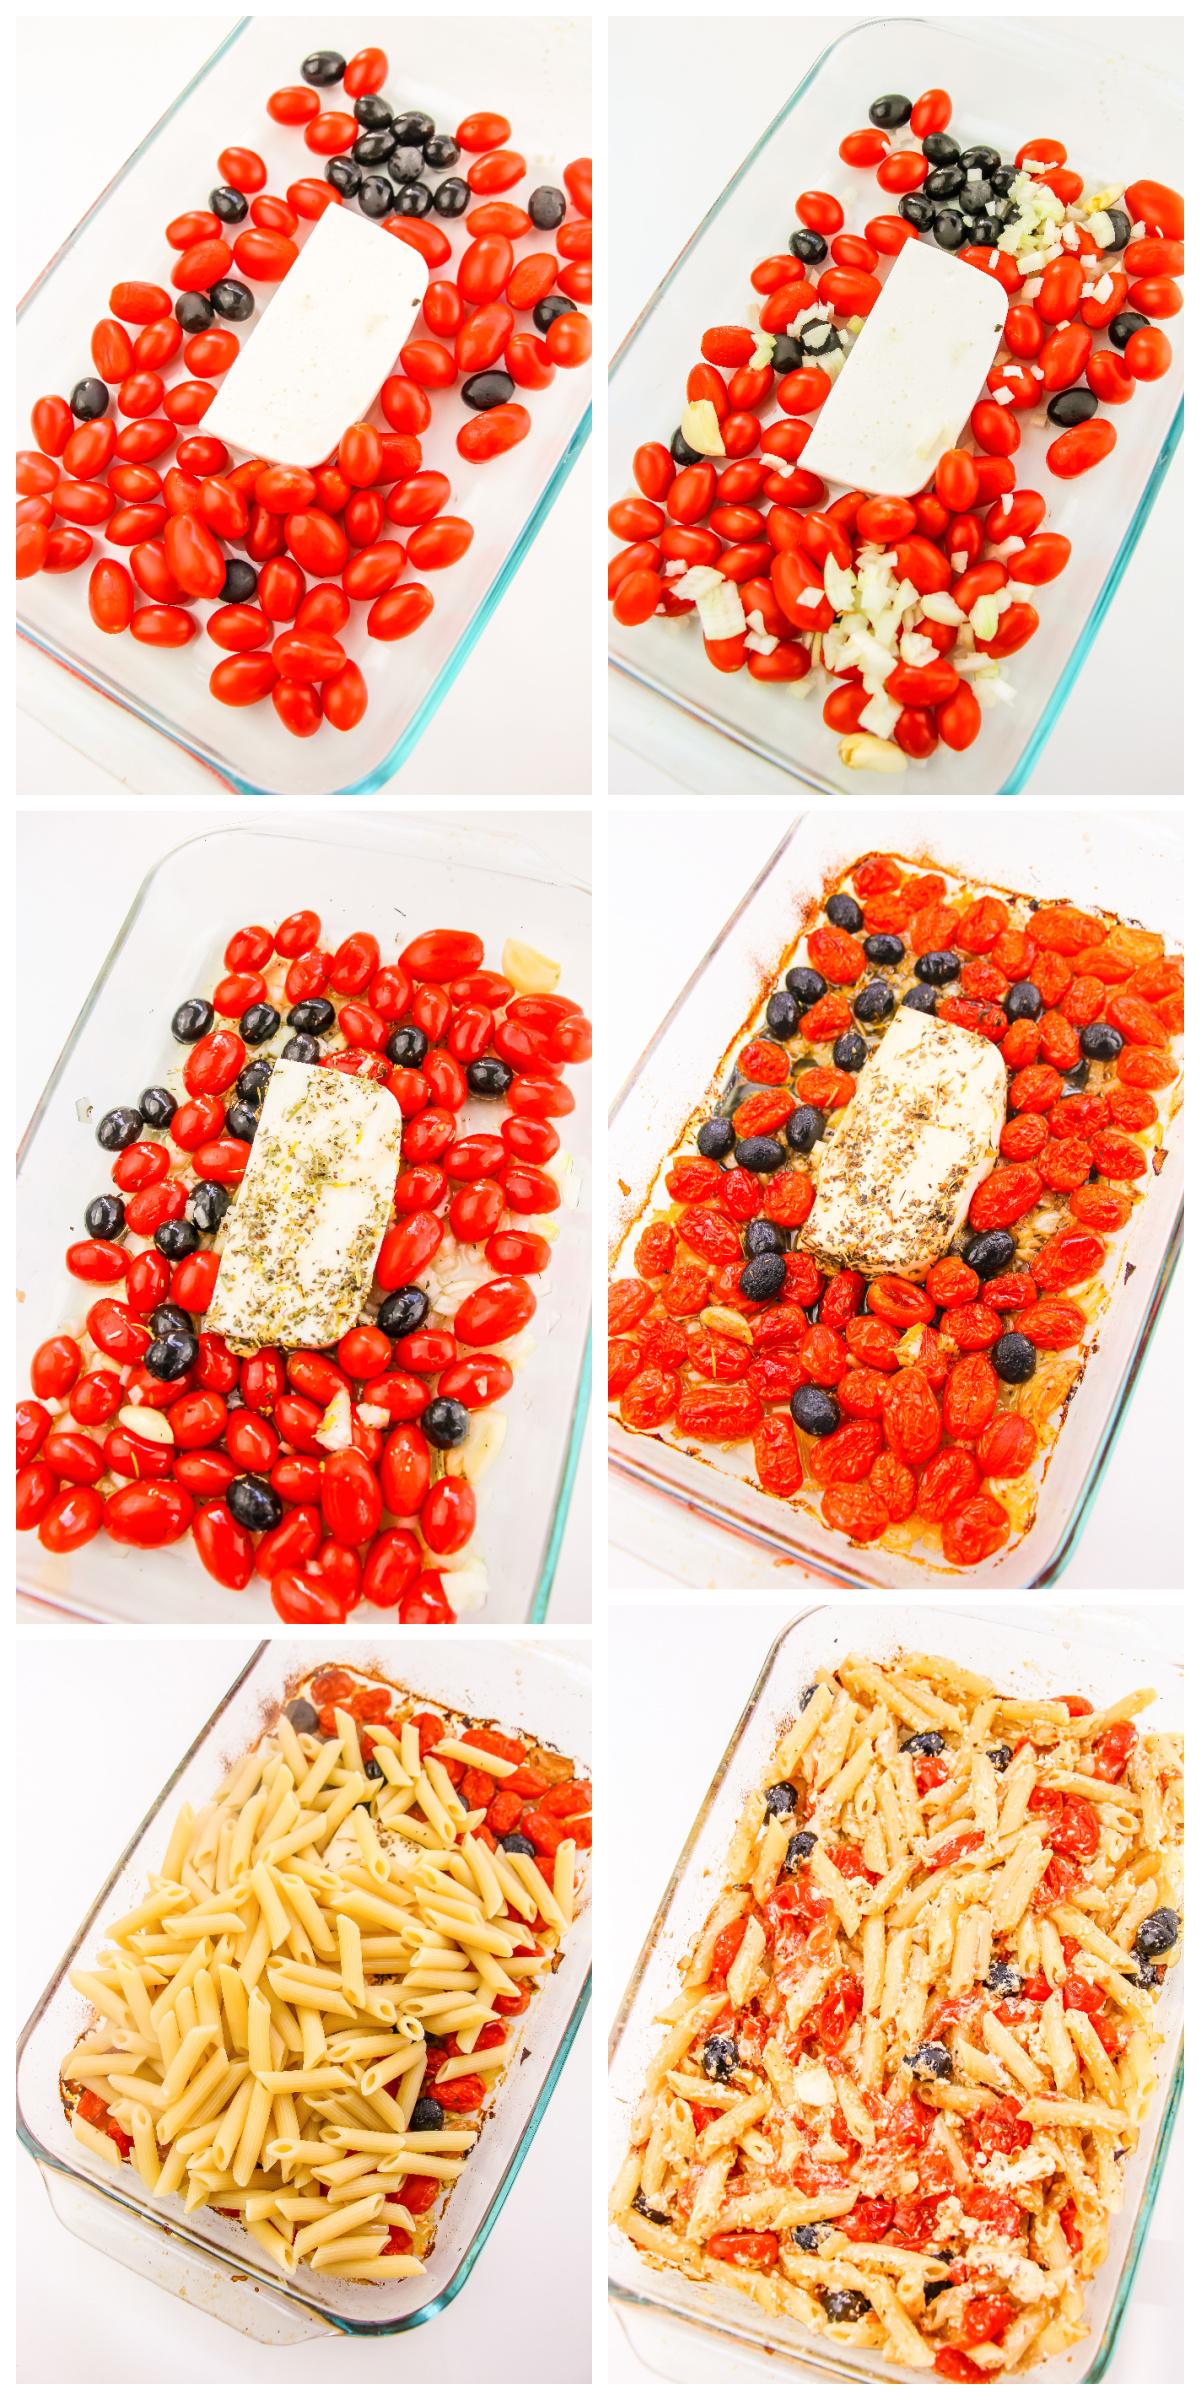 Process Photos of baking Baked Feta Pasta,